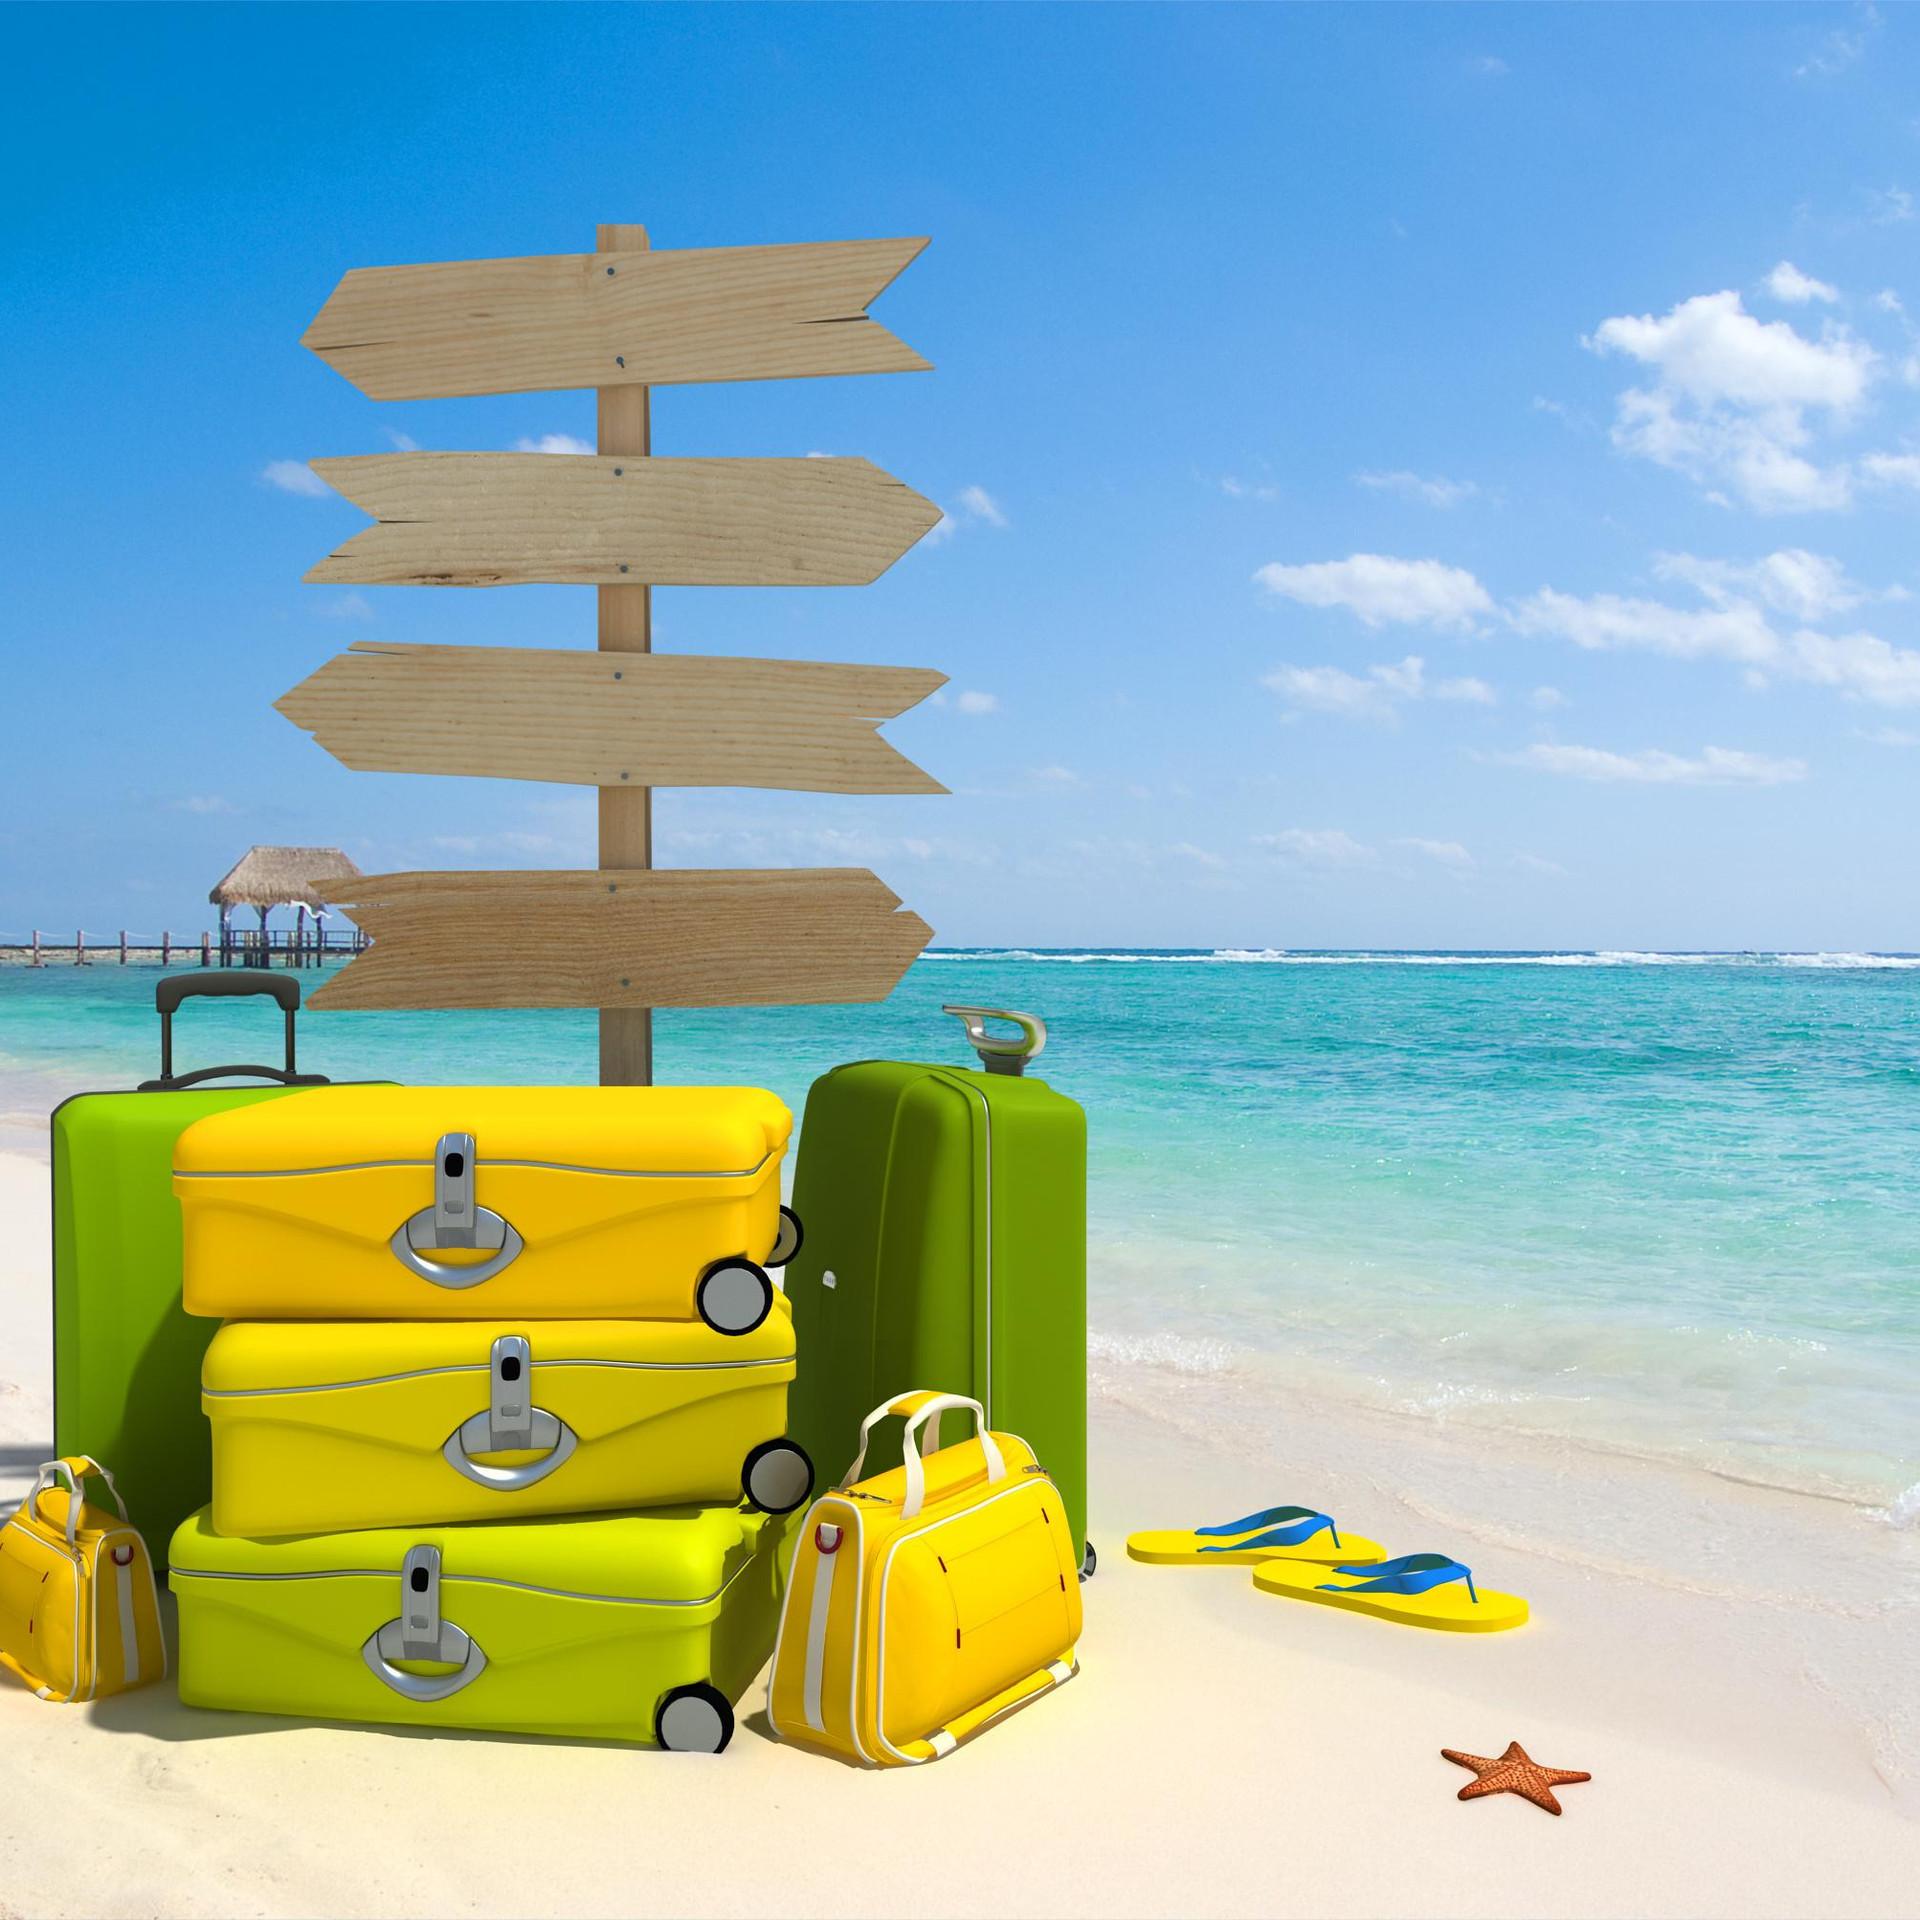 vacanze fai da te